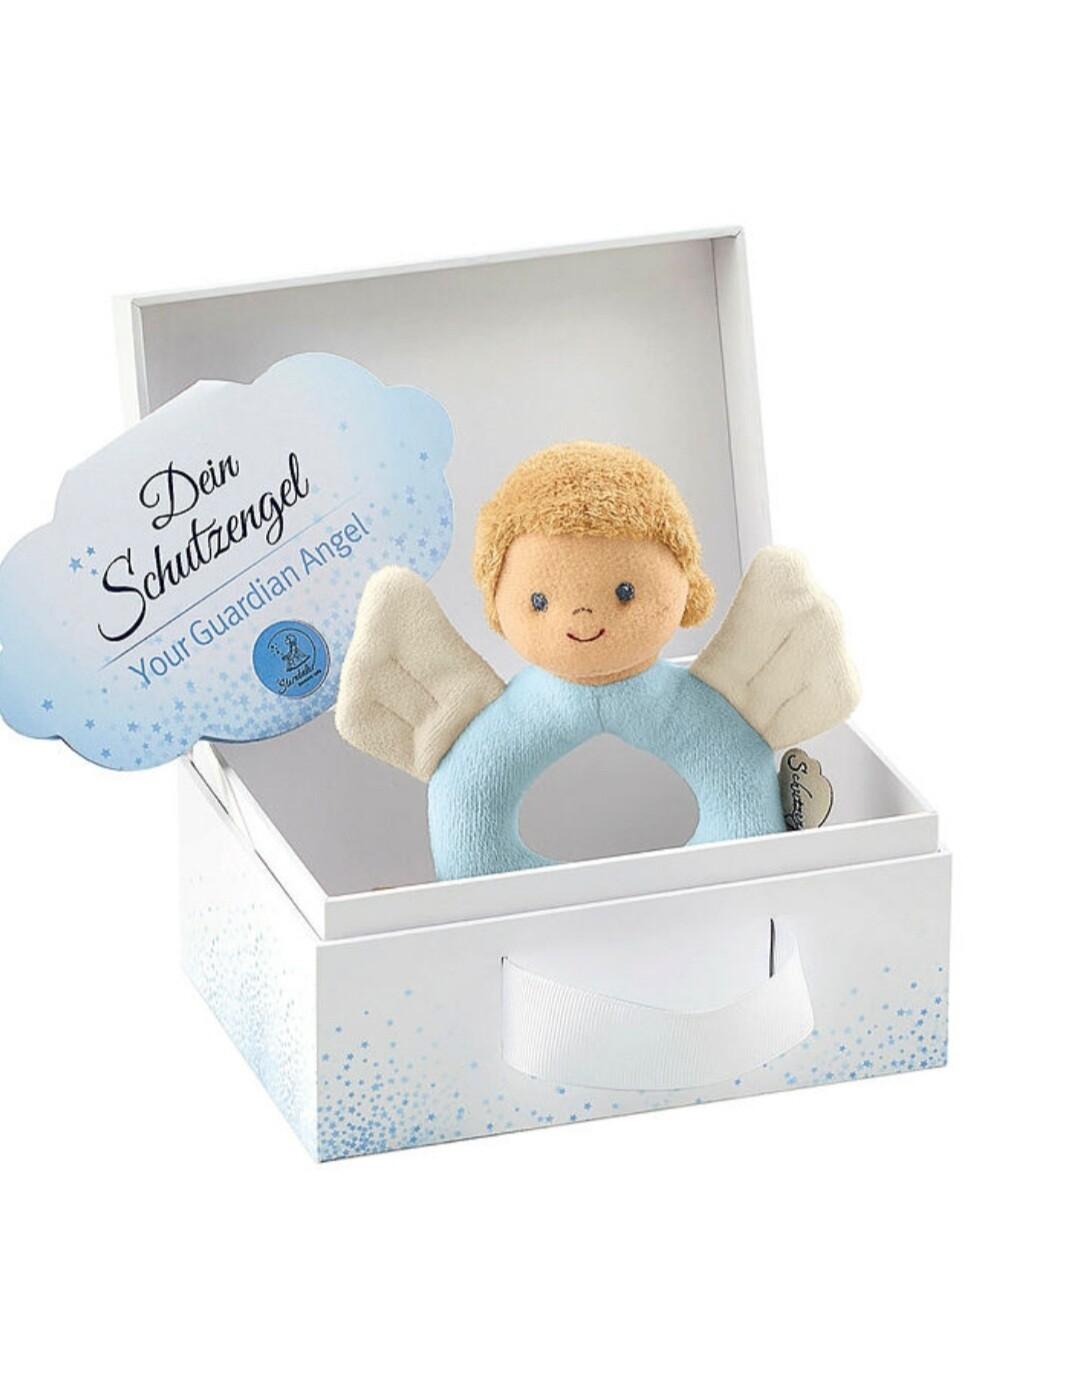 Kiddies Cuddle Guardian Blue Angel